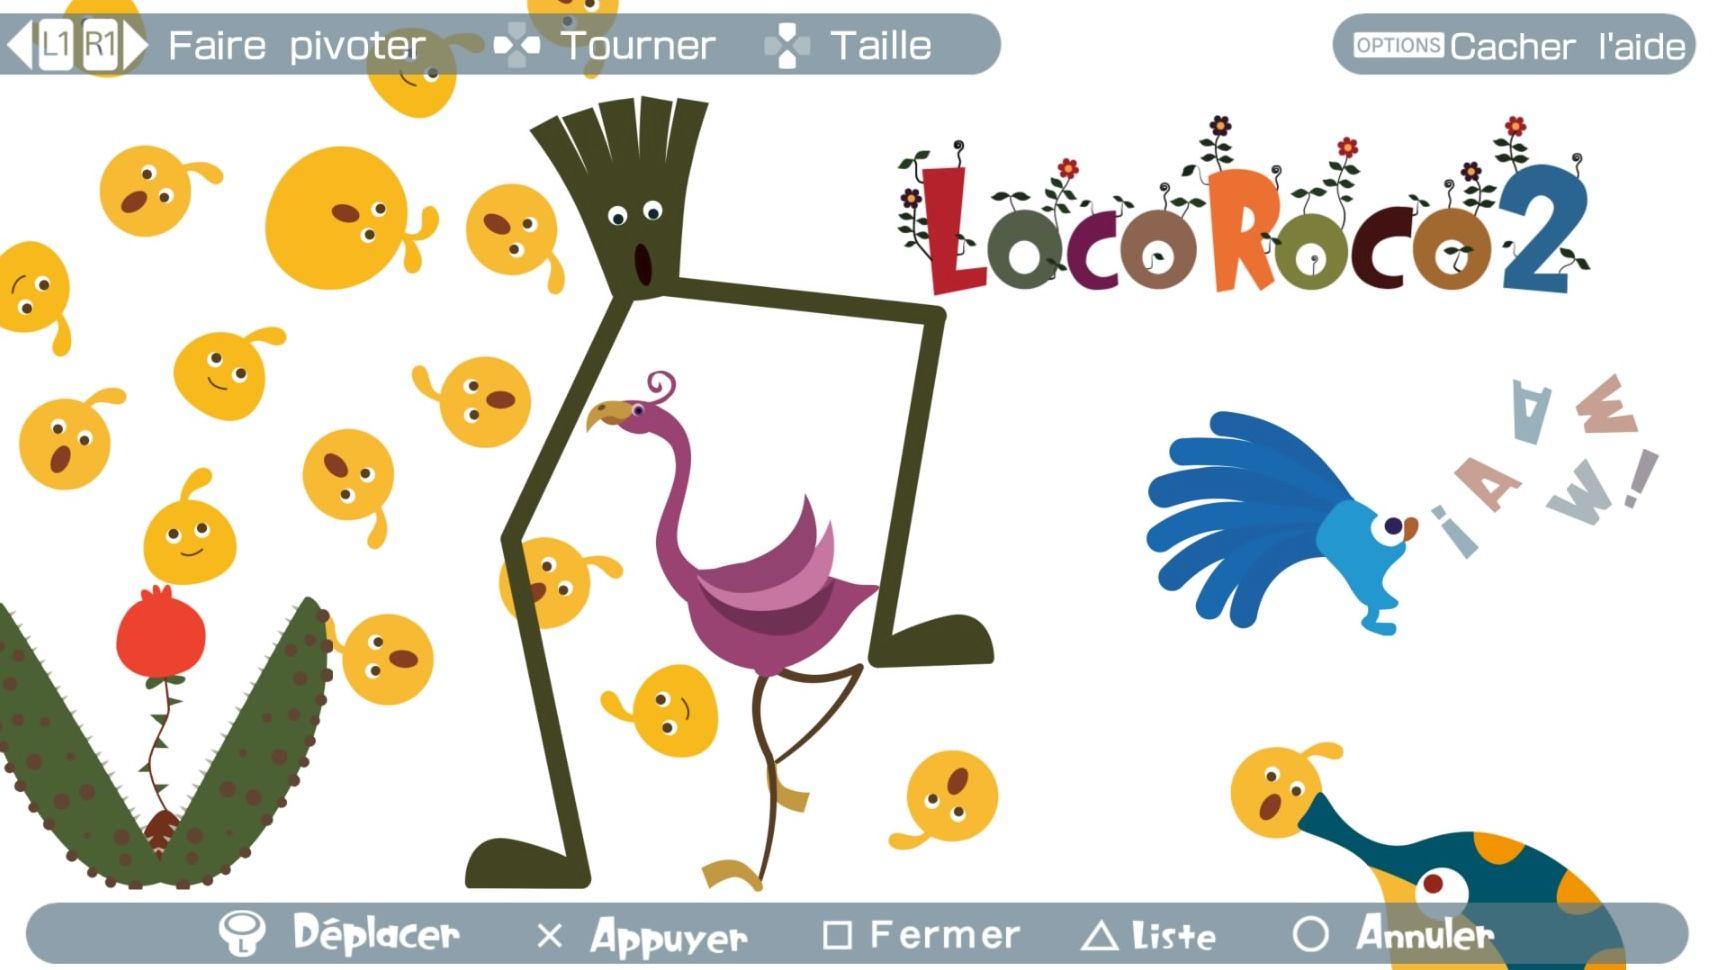 LocoRoco 2 Remastered